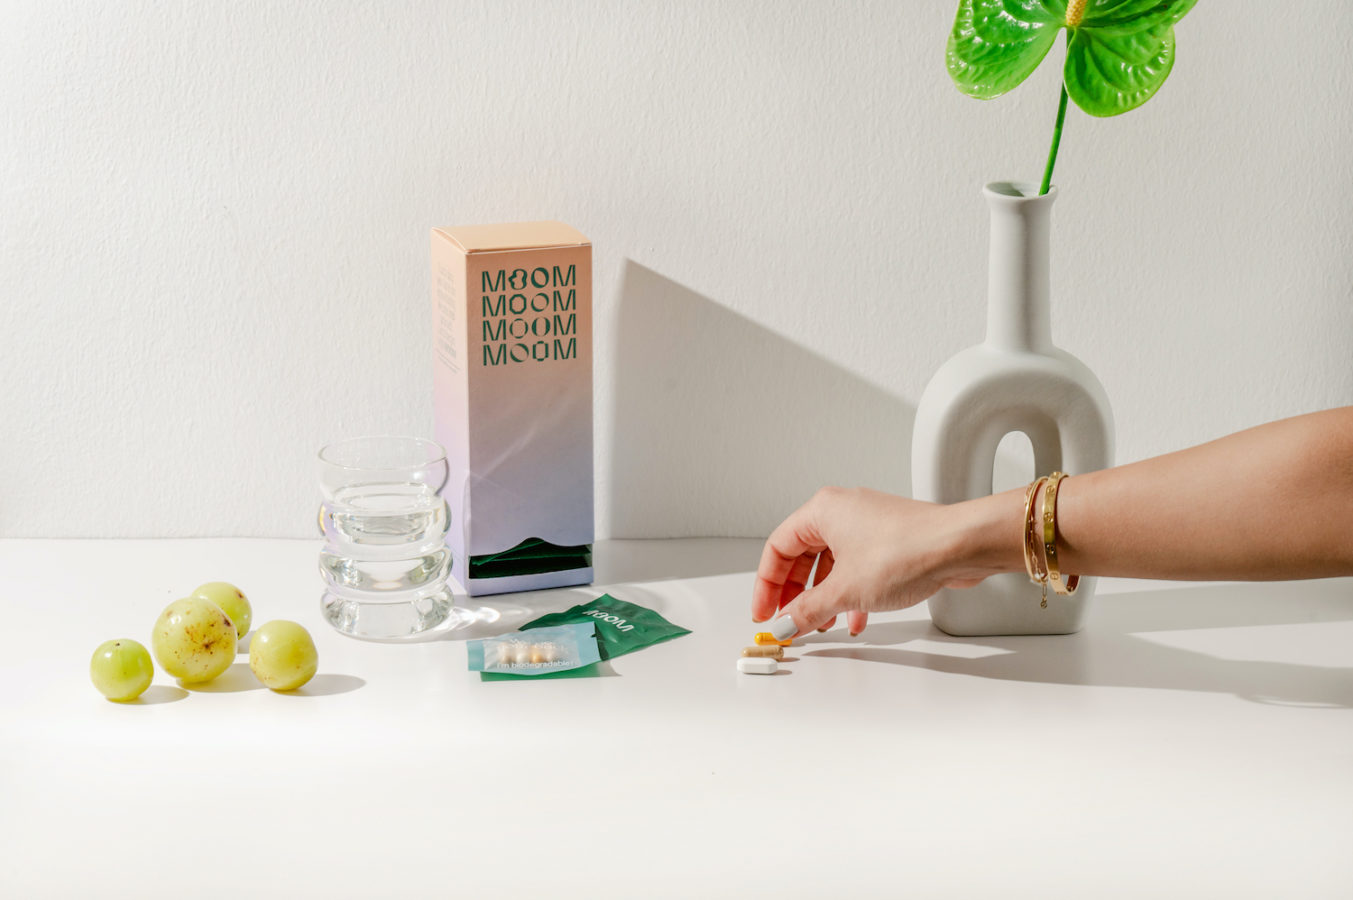 Startup Life: Meet Moom, the personalised health platform revolutionising supplements